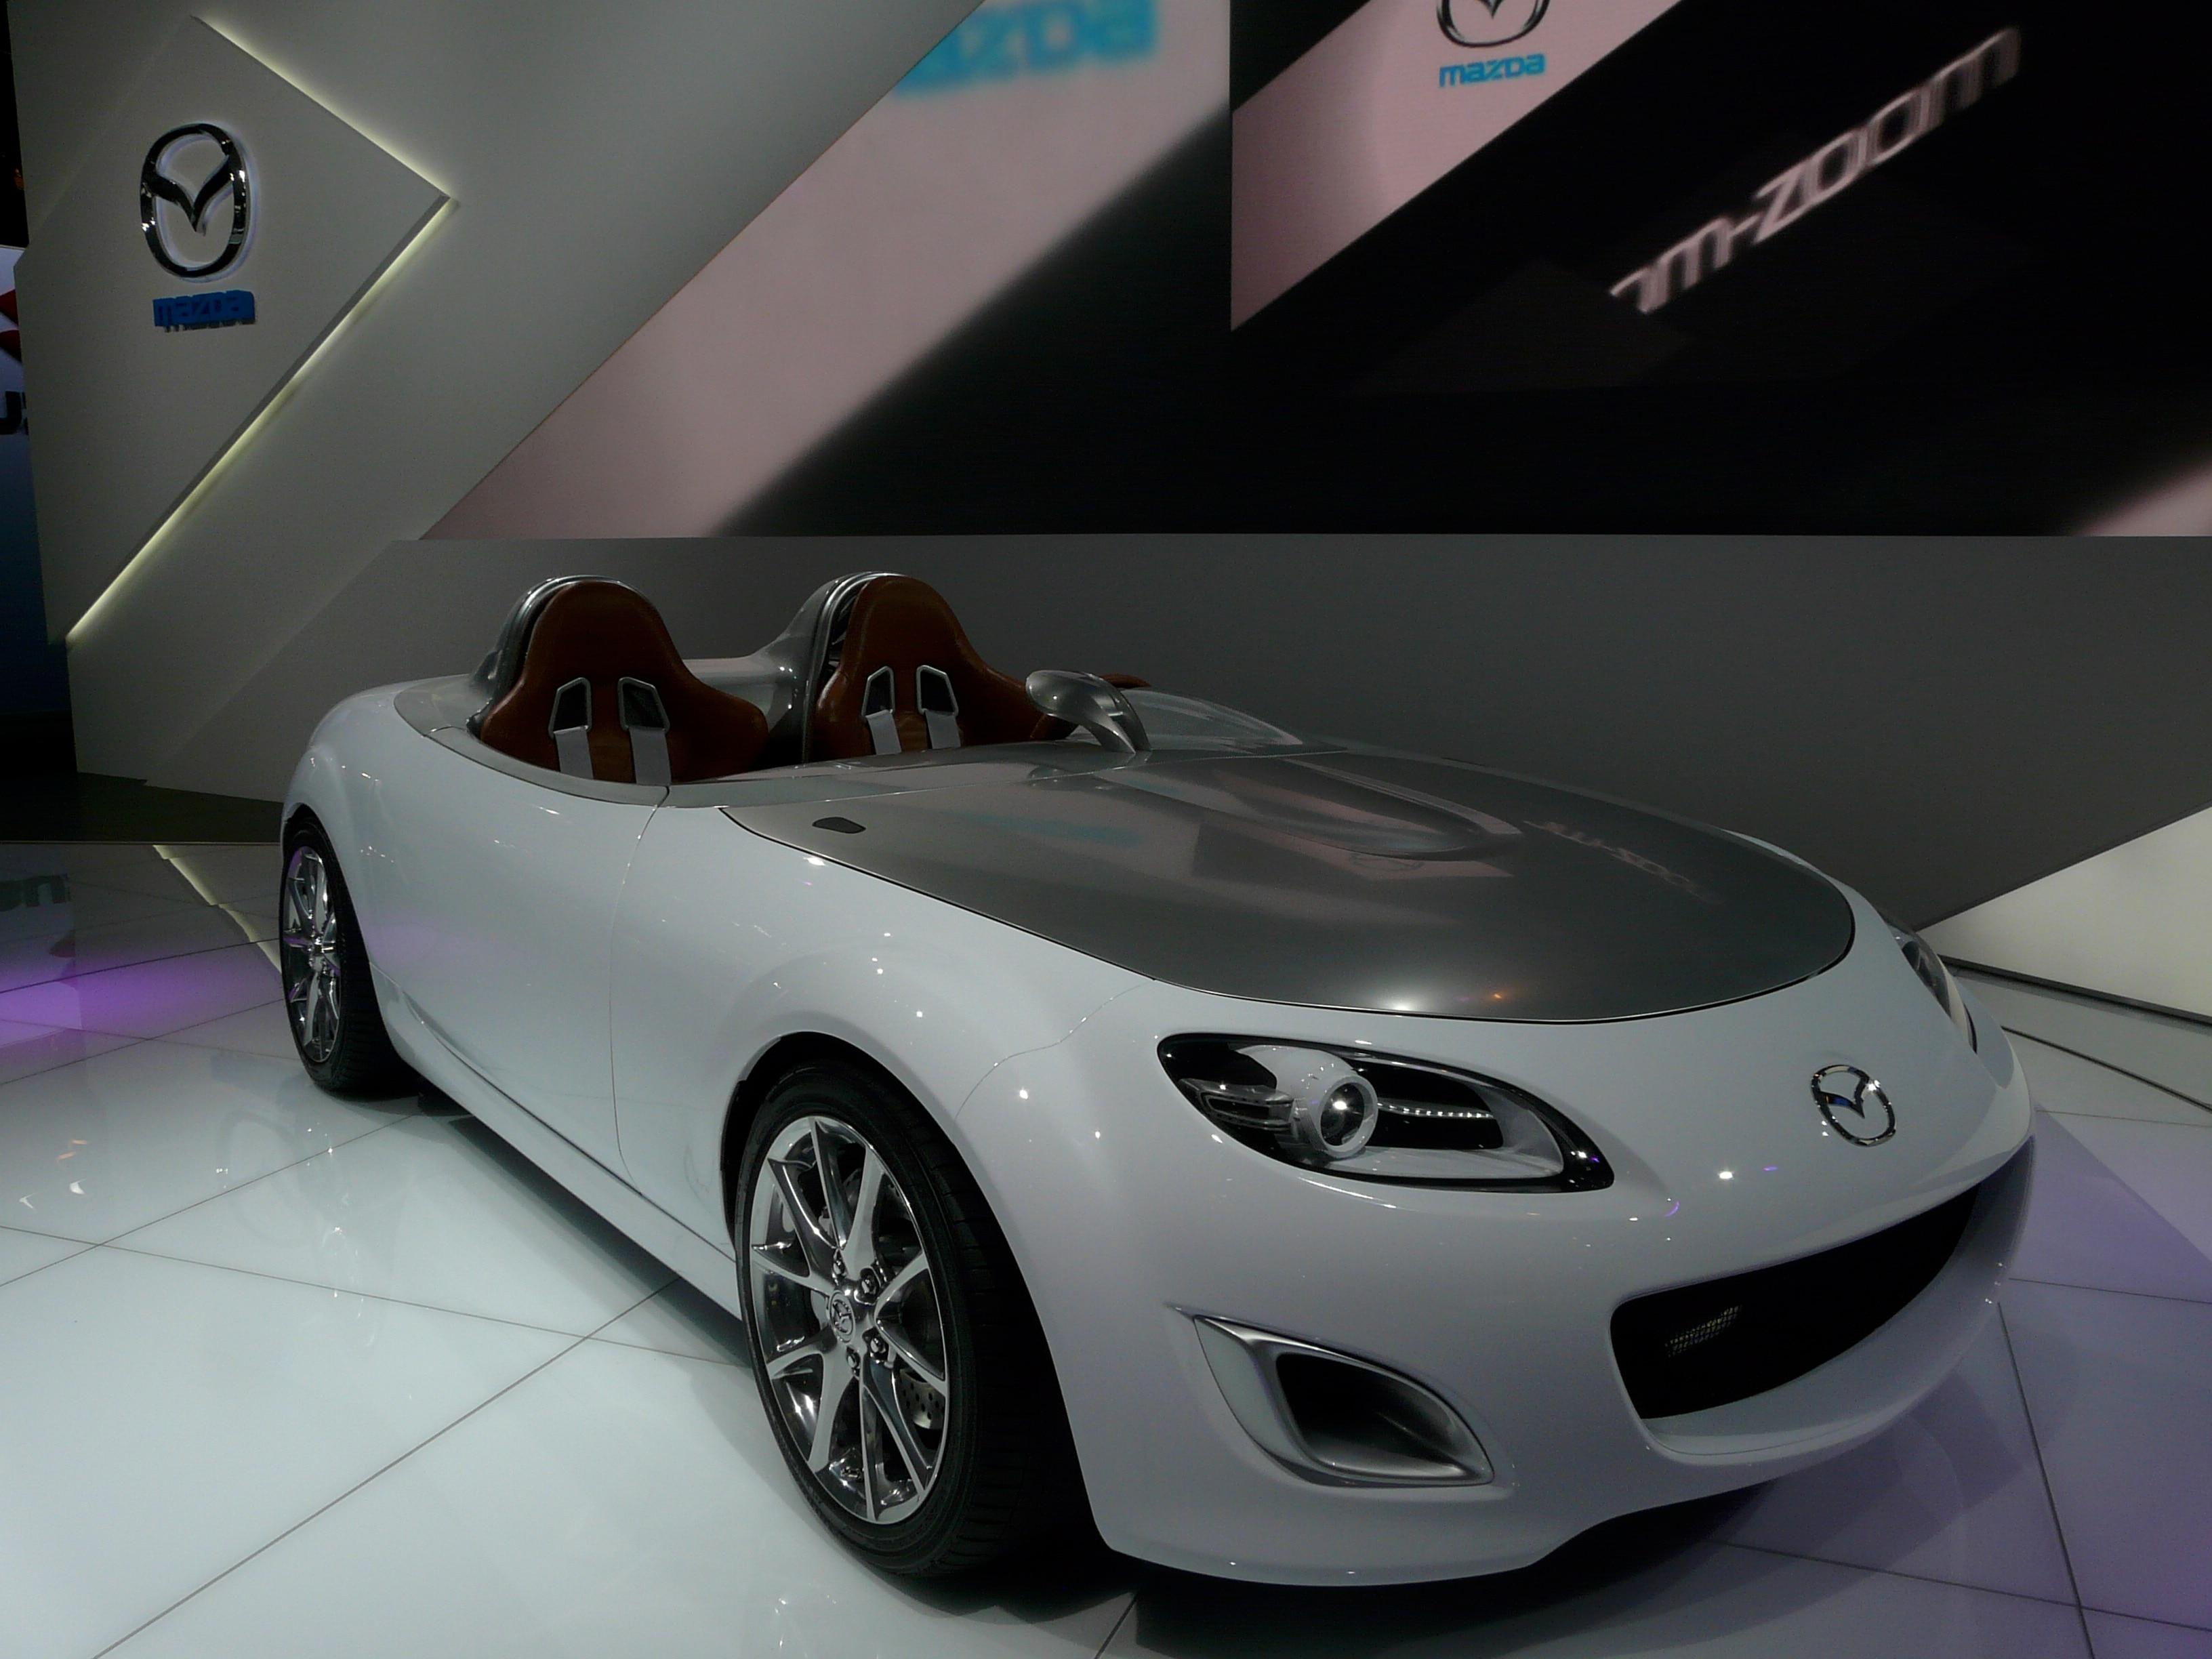 2009 frankfurt auto show mazda mx 5 superlight version. Black Bedroom Furniture Sets. Home Design Ideas